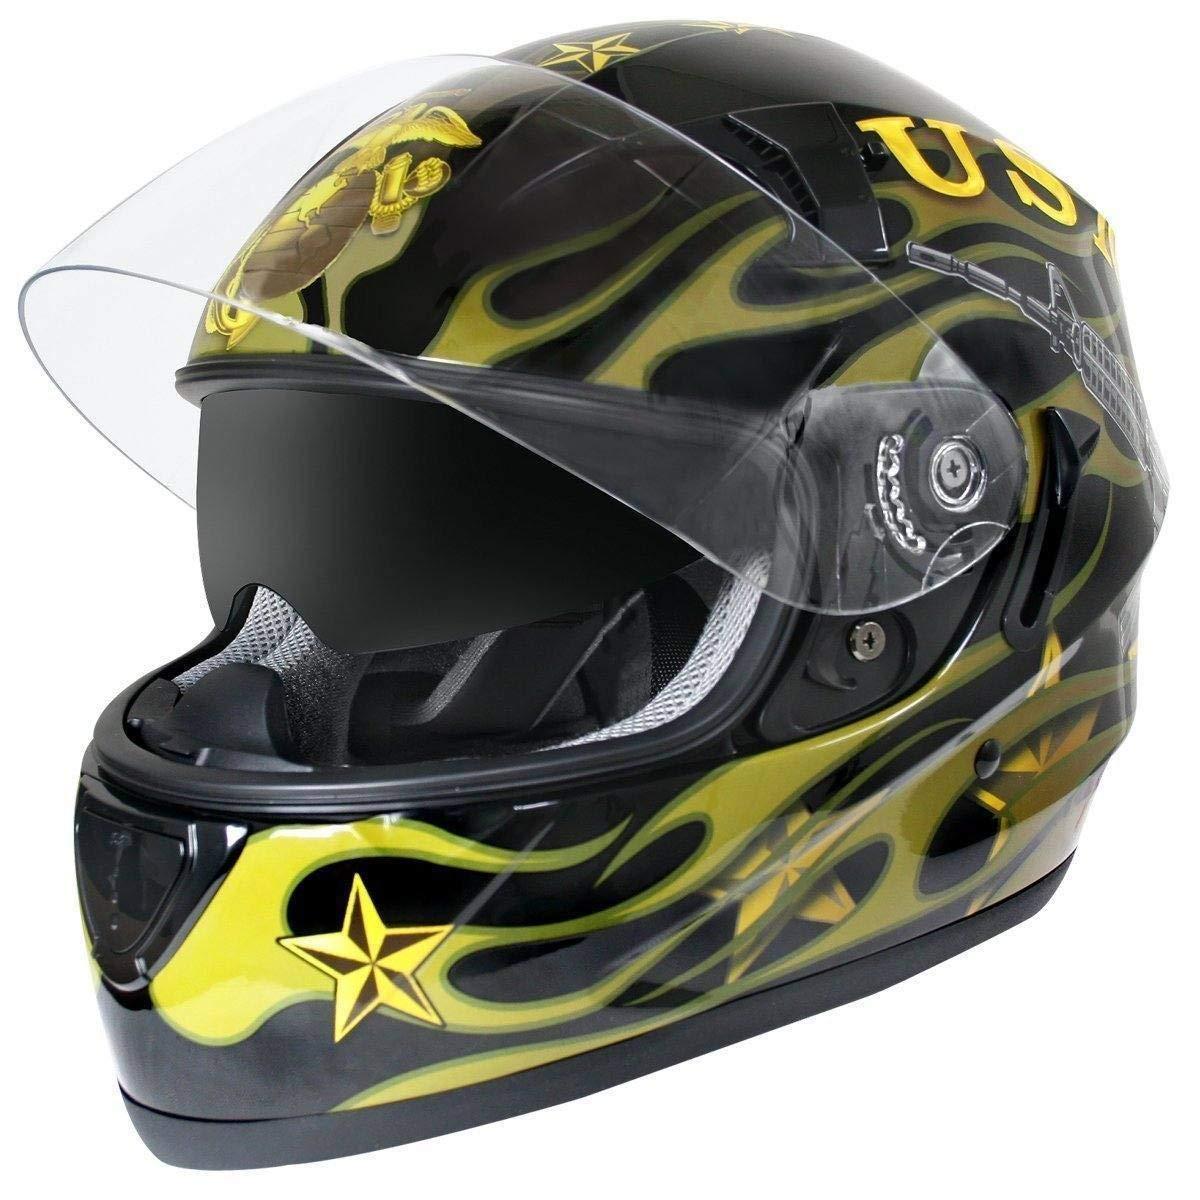 ec1b68cd Hawk ST-1150 Glossy Dual Visor Full Face Motorcycle Helmet with U.S.  Marines Gr - Medium